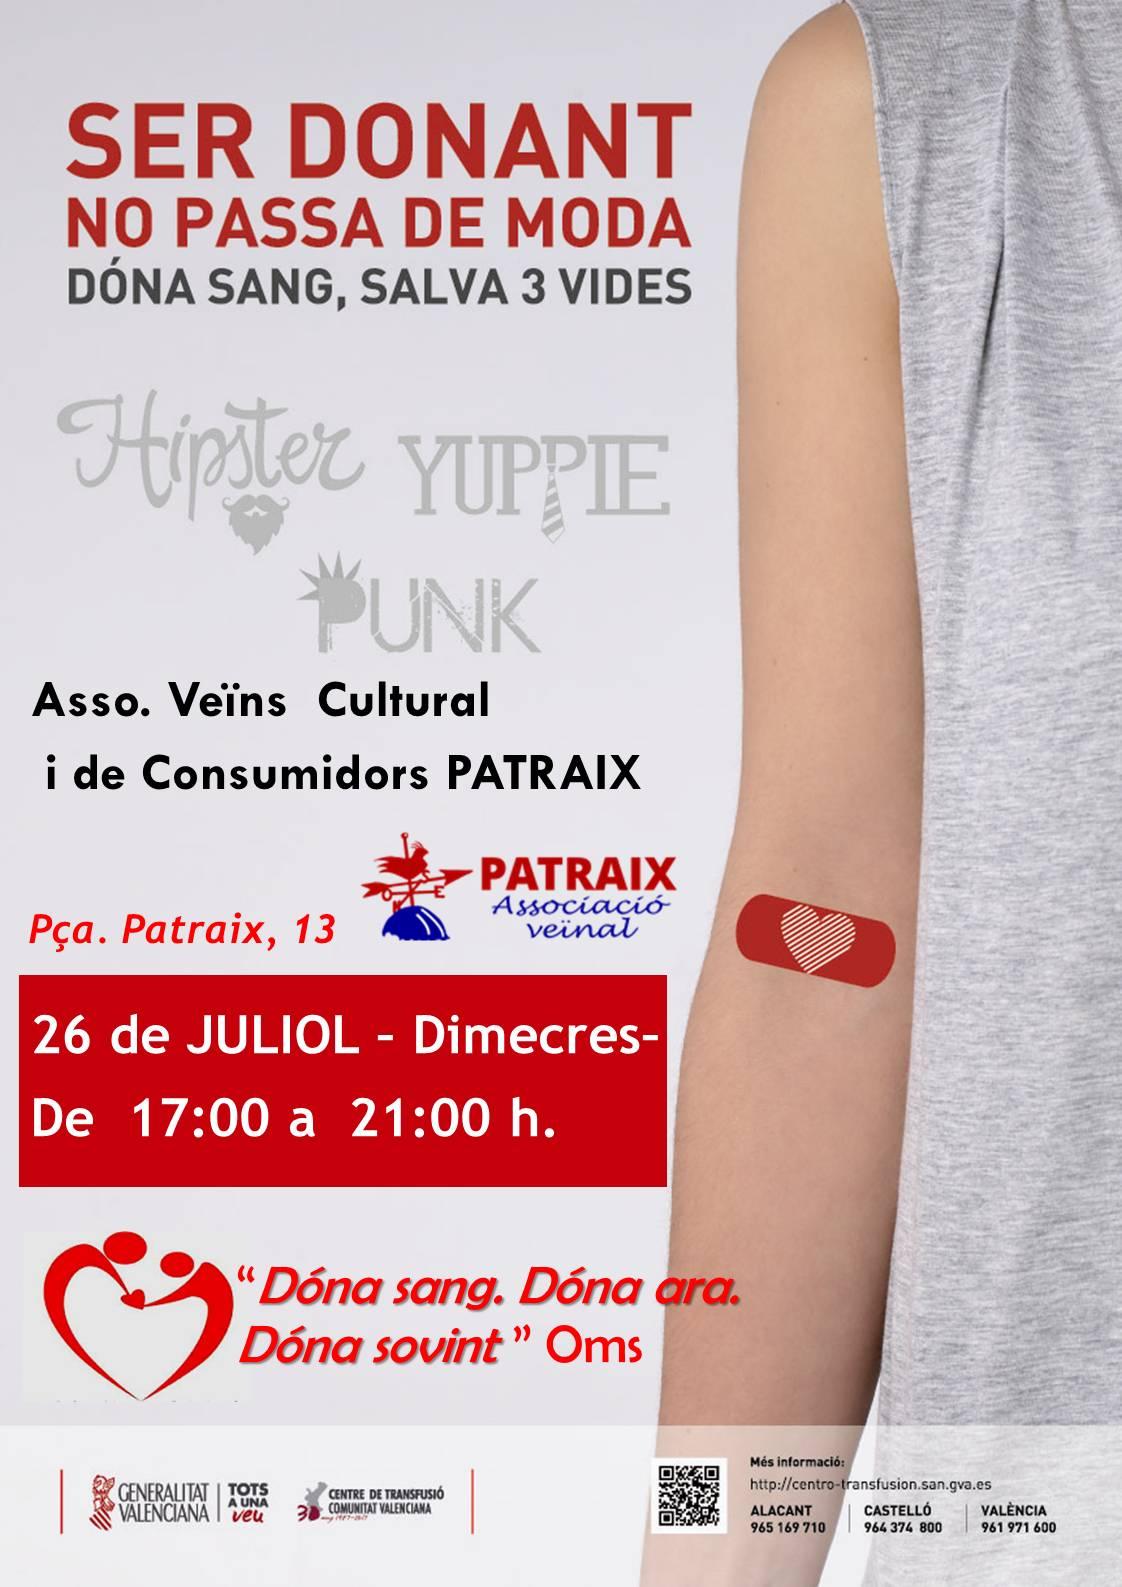 Donación de sangre 26/07/17